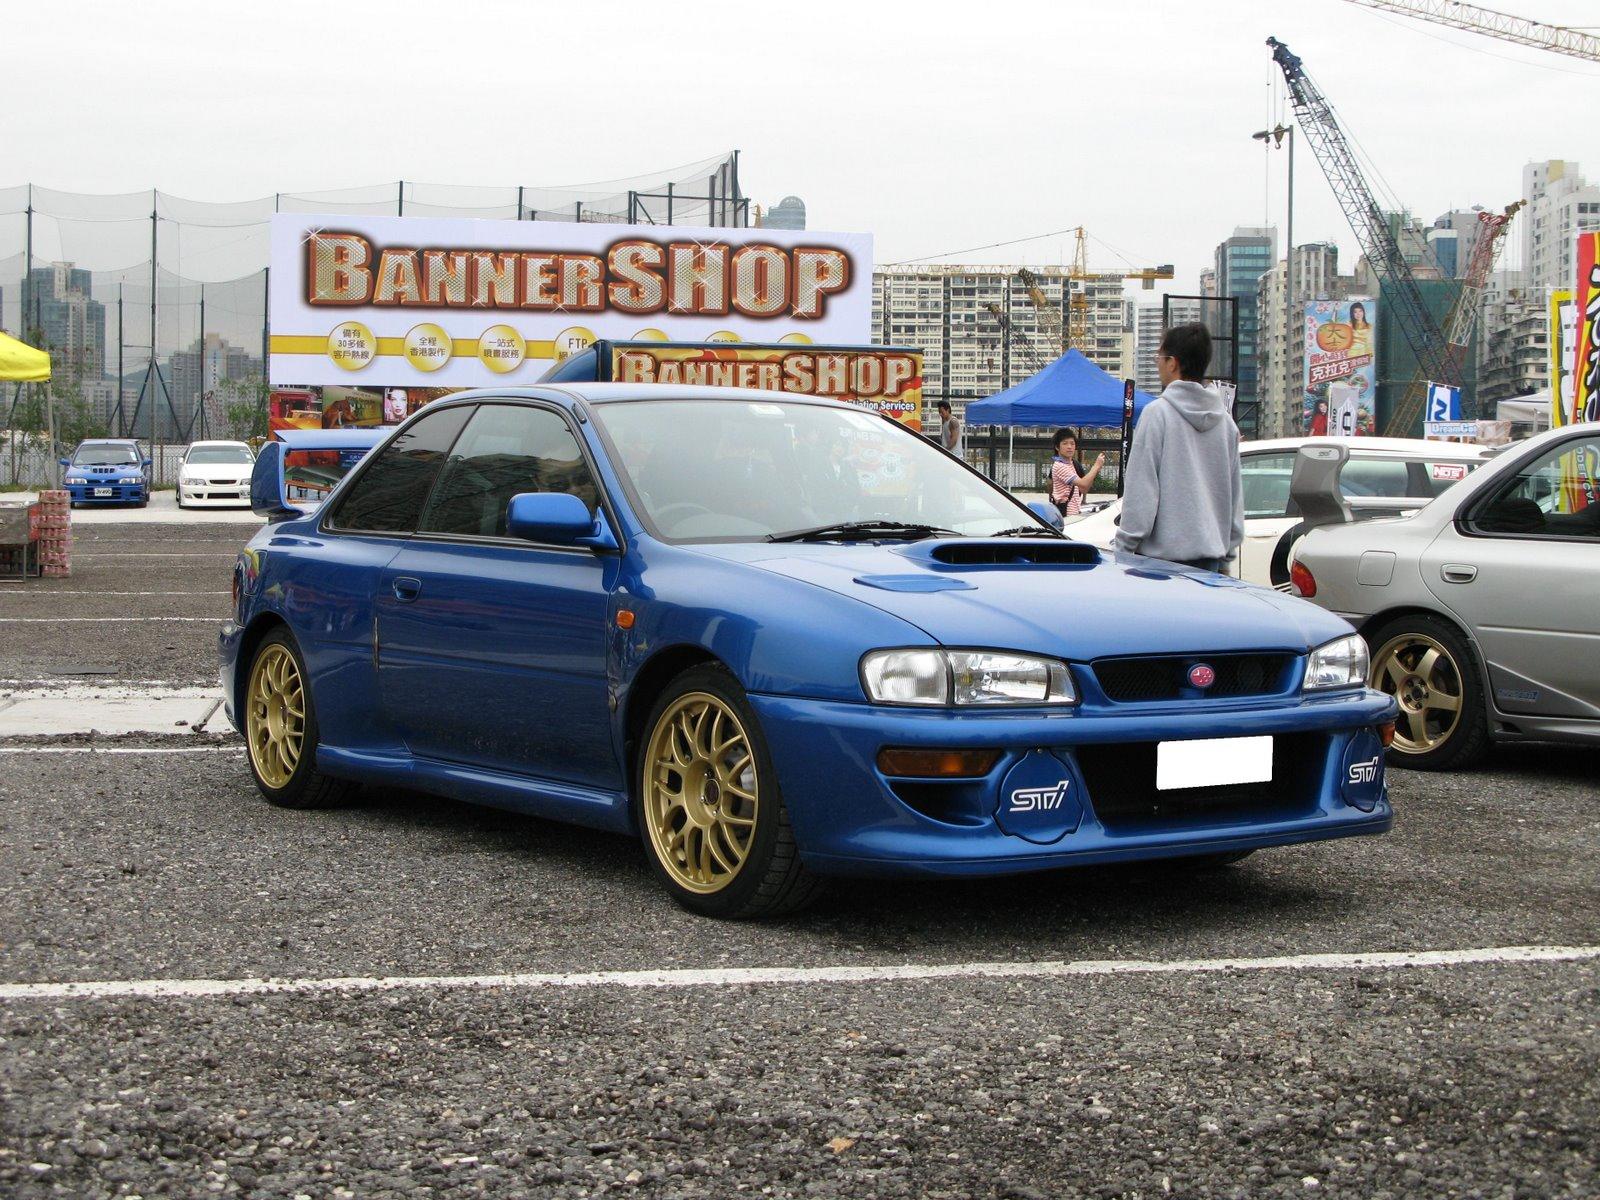 My Perfect Subaru Impreza 22b 3dtuning Probably The